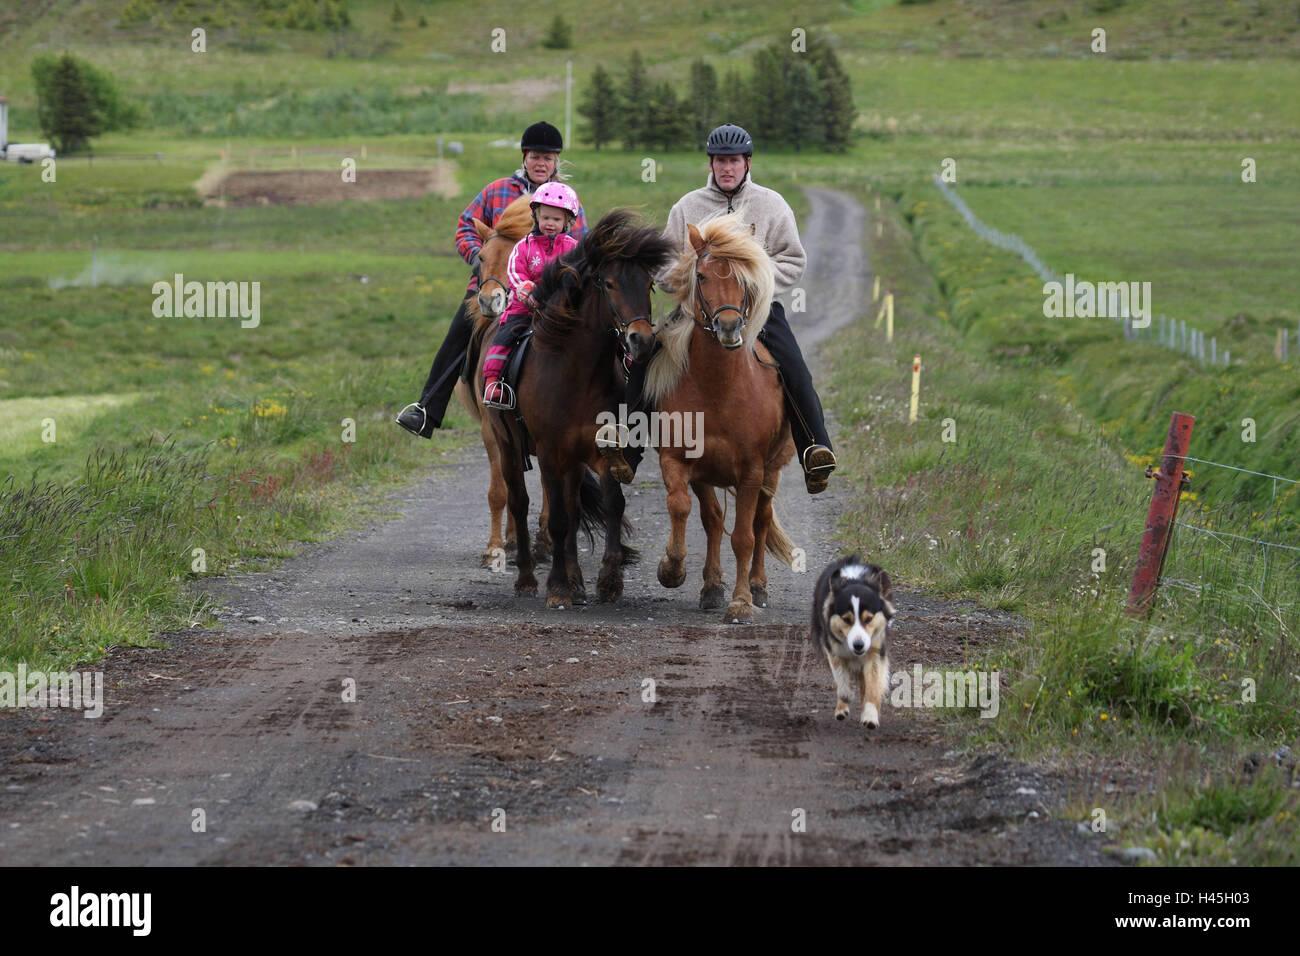 Iceland, family, ride, - Stock Image